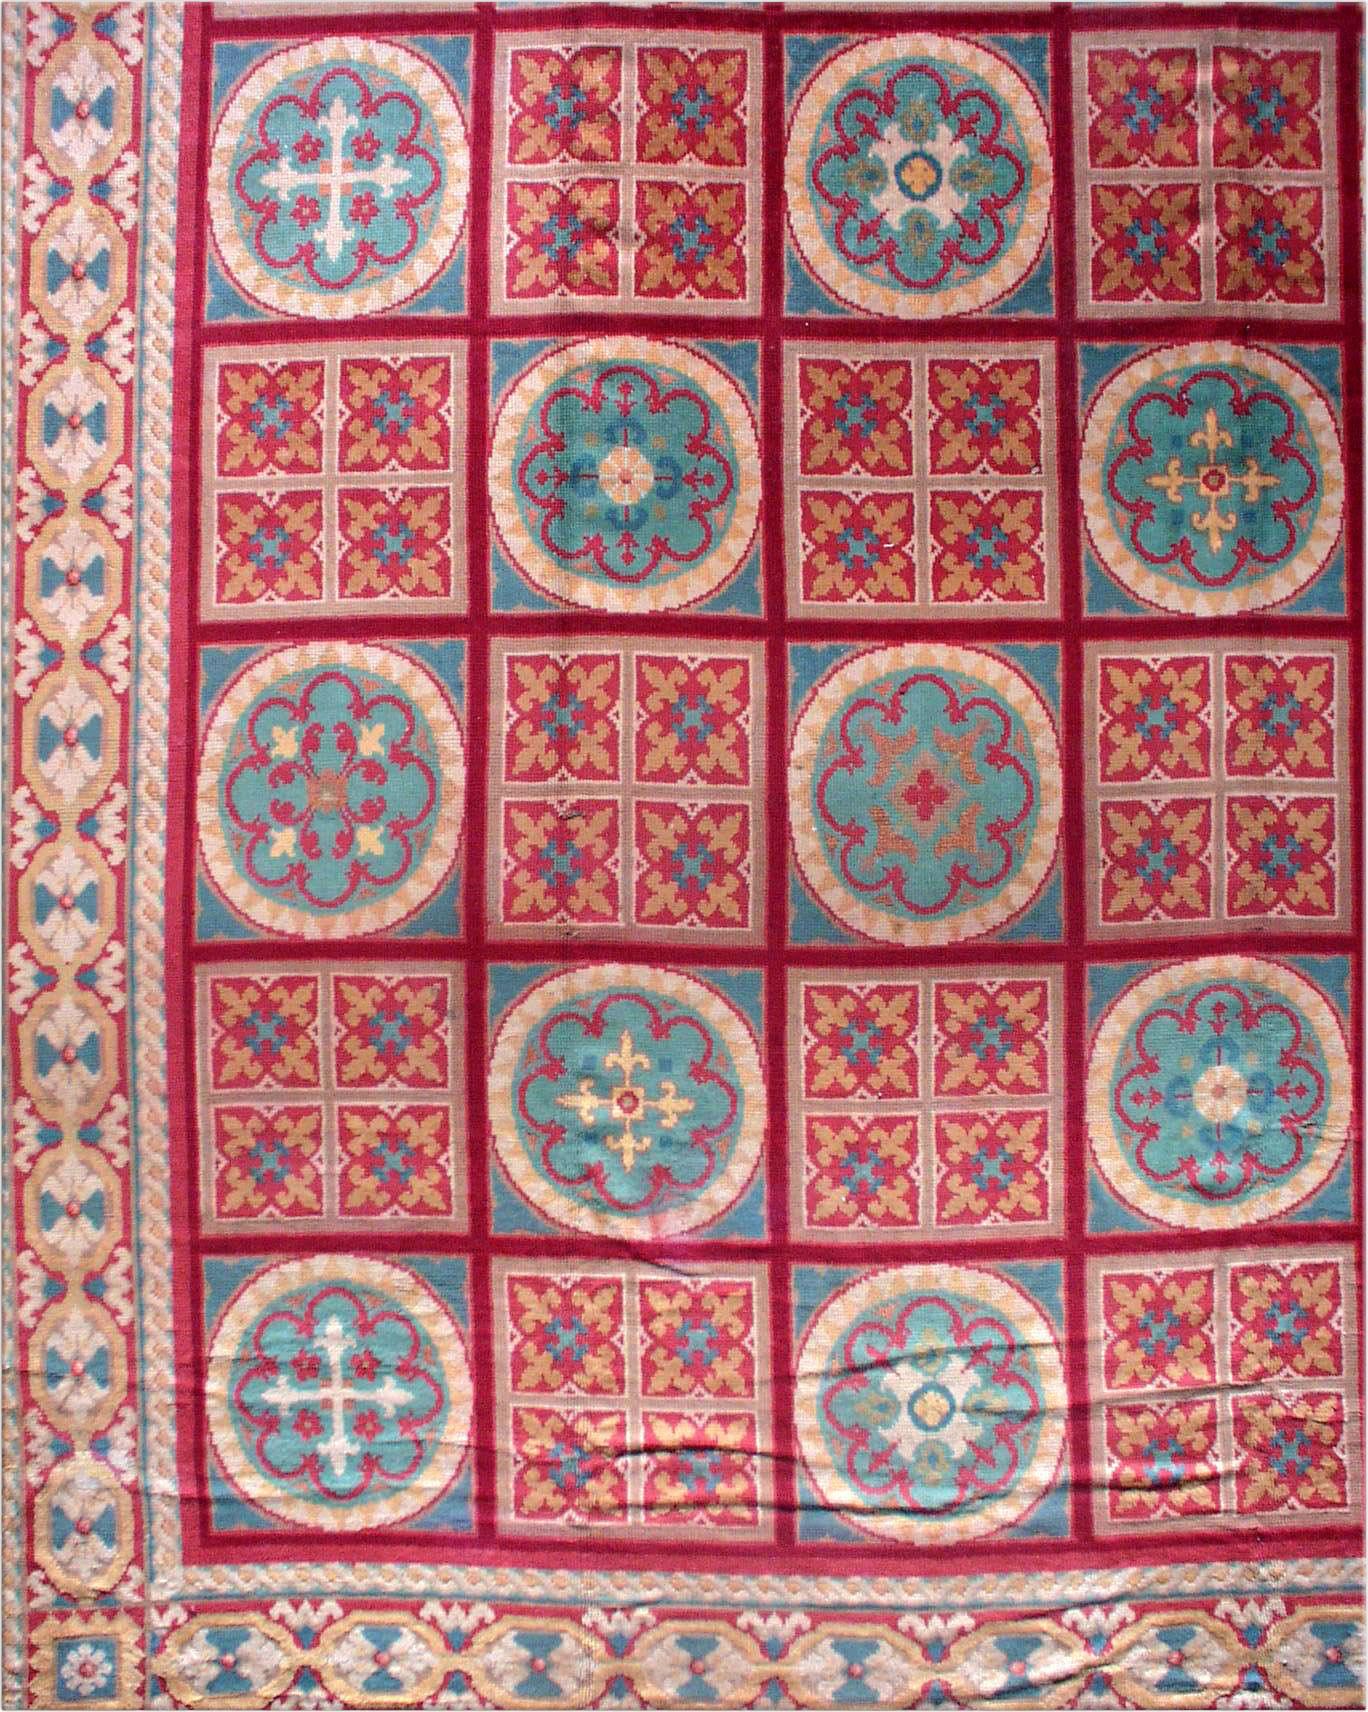 Spanish rug - Vintage Rug - BB0480 by Doris Leslie Blau